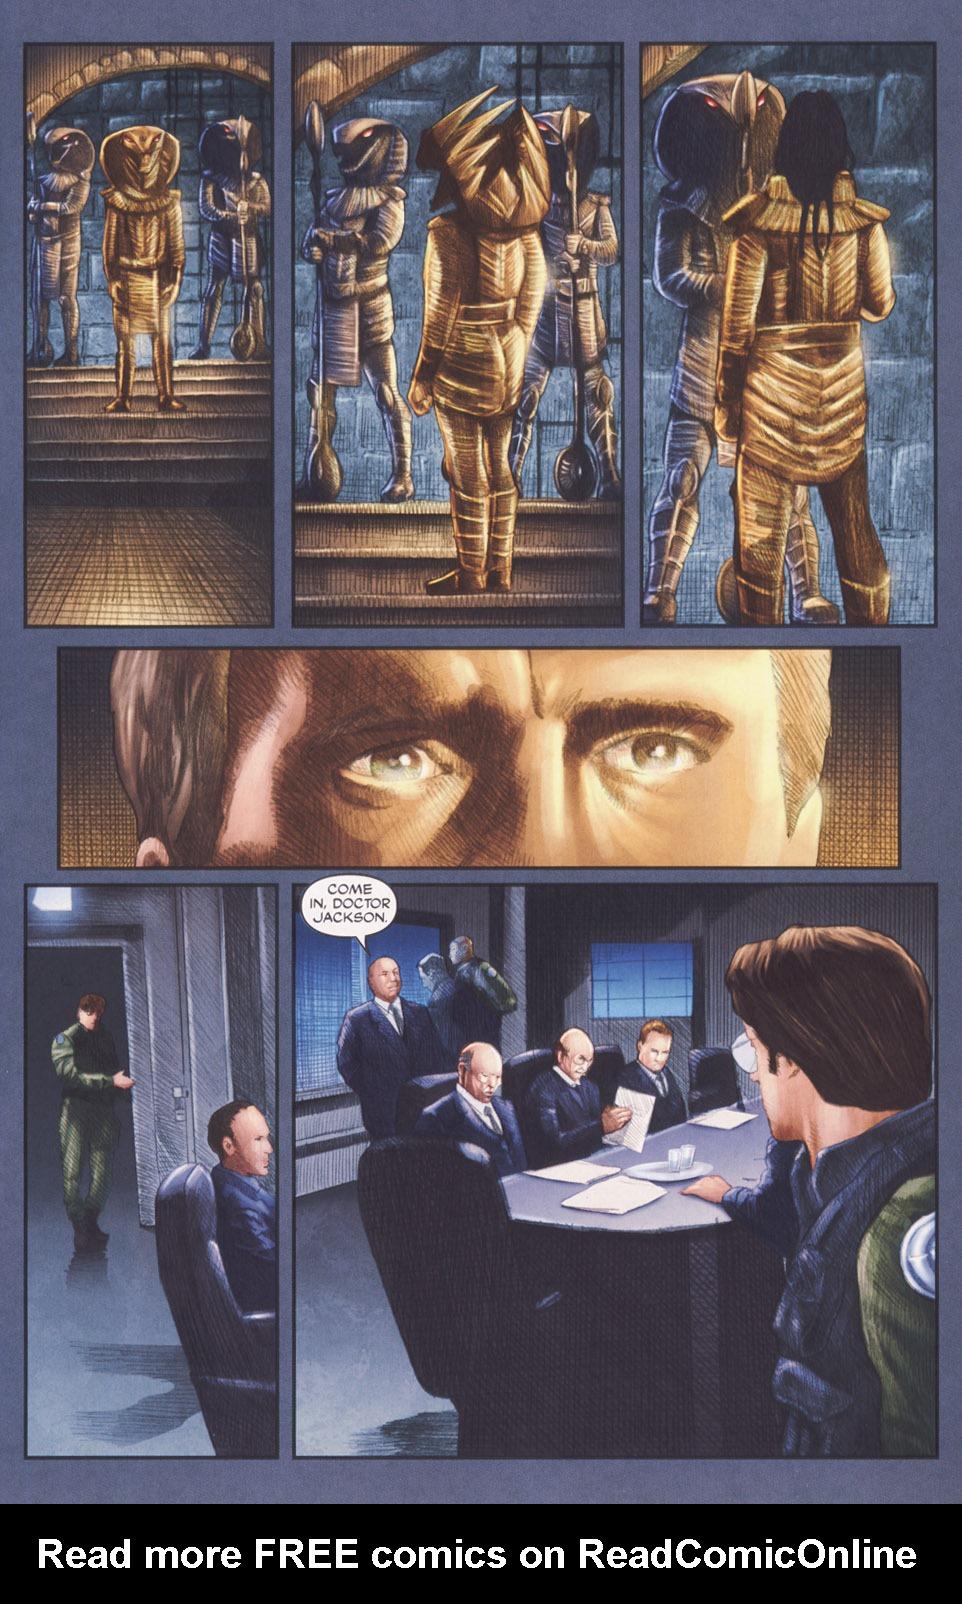 Read online Stargate SG-1: POW comic -  Issue #2 - 9